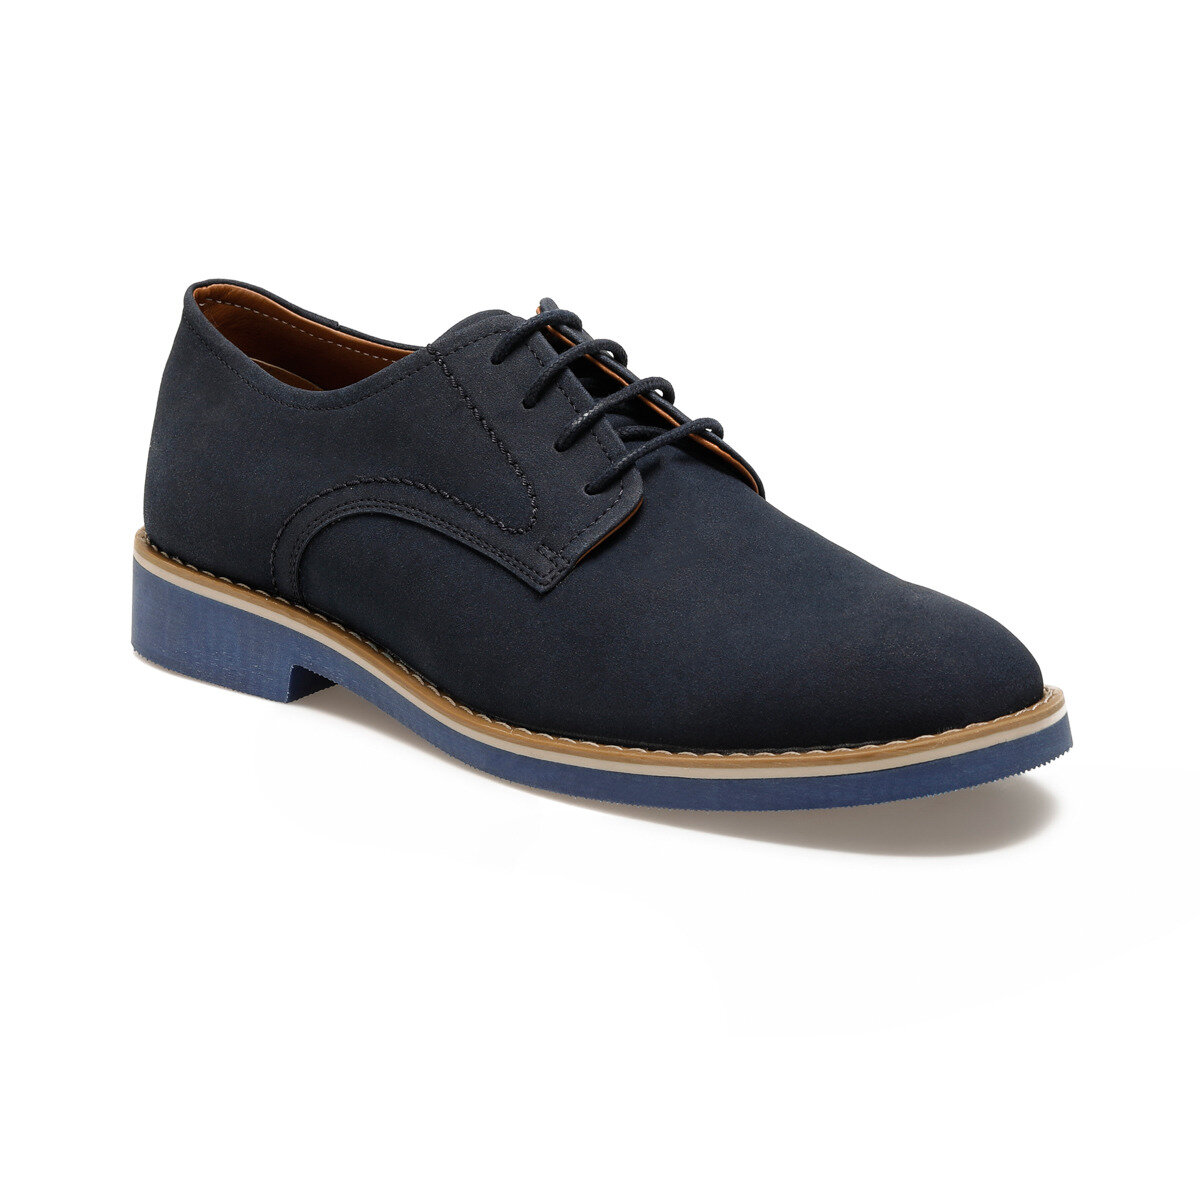 FLO MST-1 Navy Blue Men 'S Dress Shoes-Styles